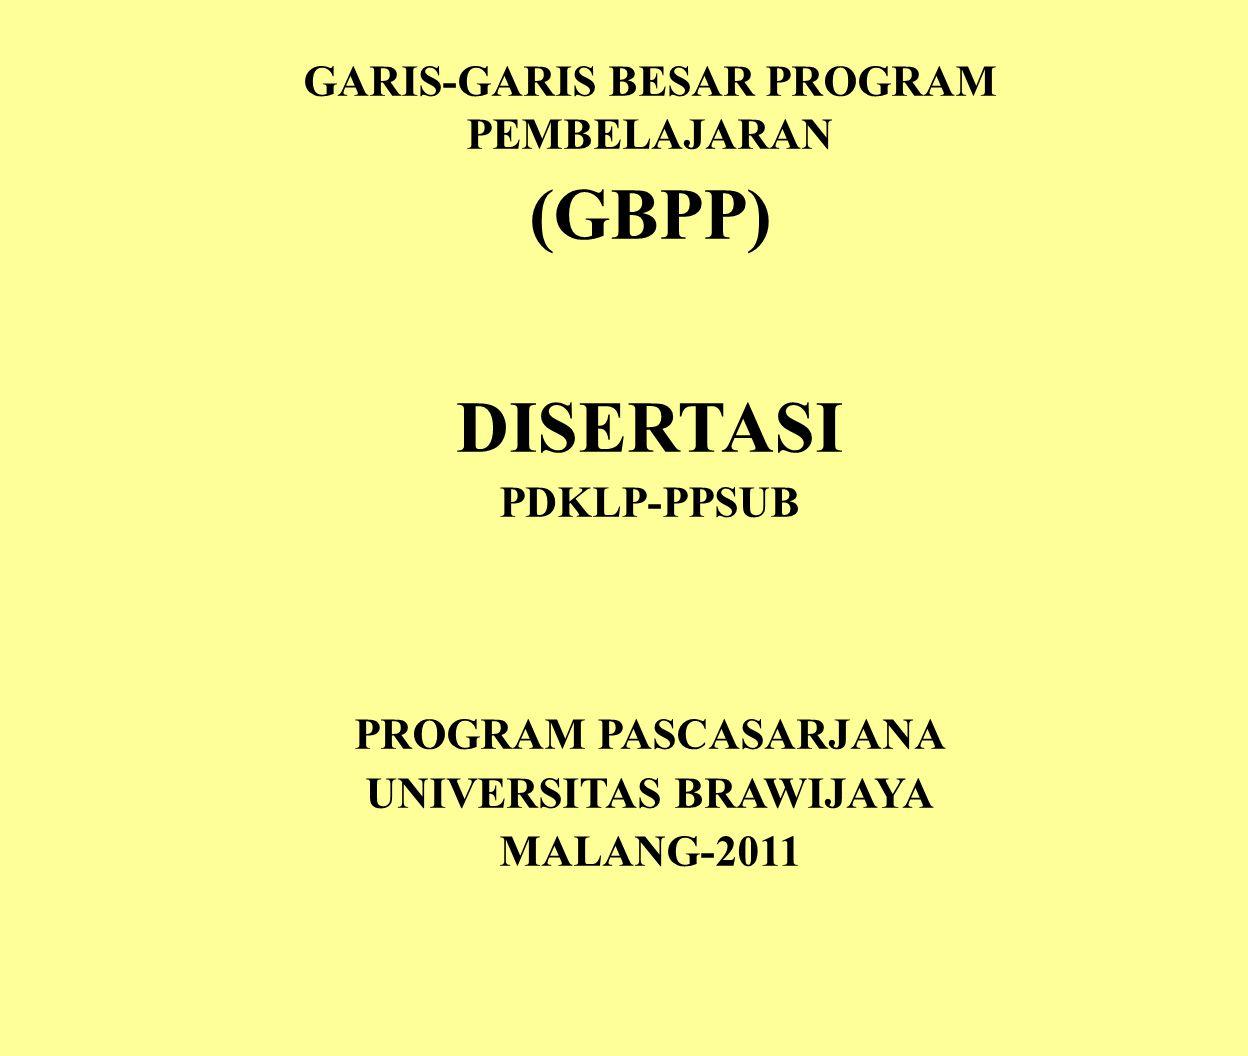 POKOK-POKOK PROGRAM DISERTASI 1.Disertasi menjadi bagian integral Kurikulum PDIL PPSUB 2.